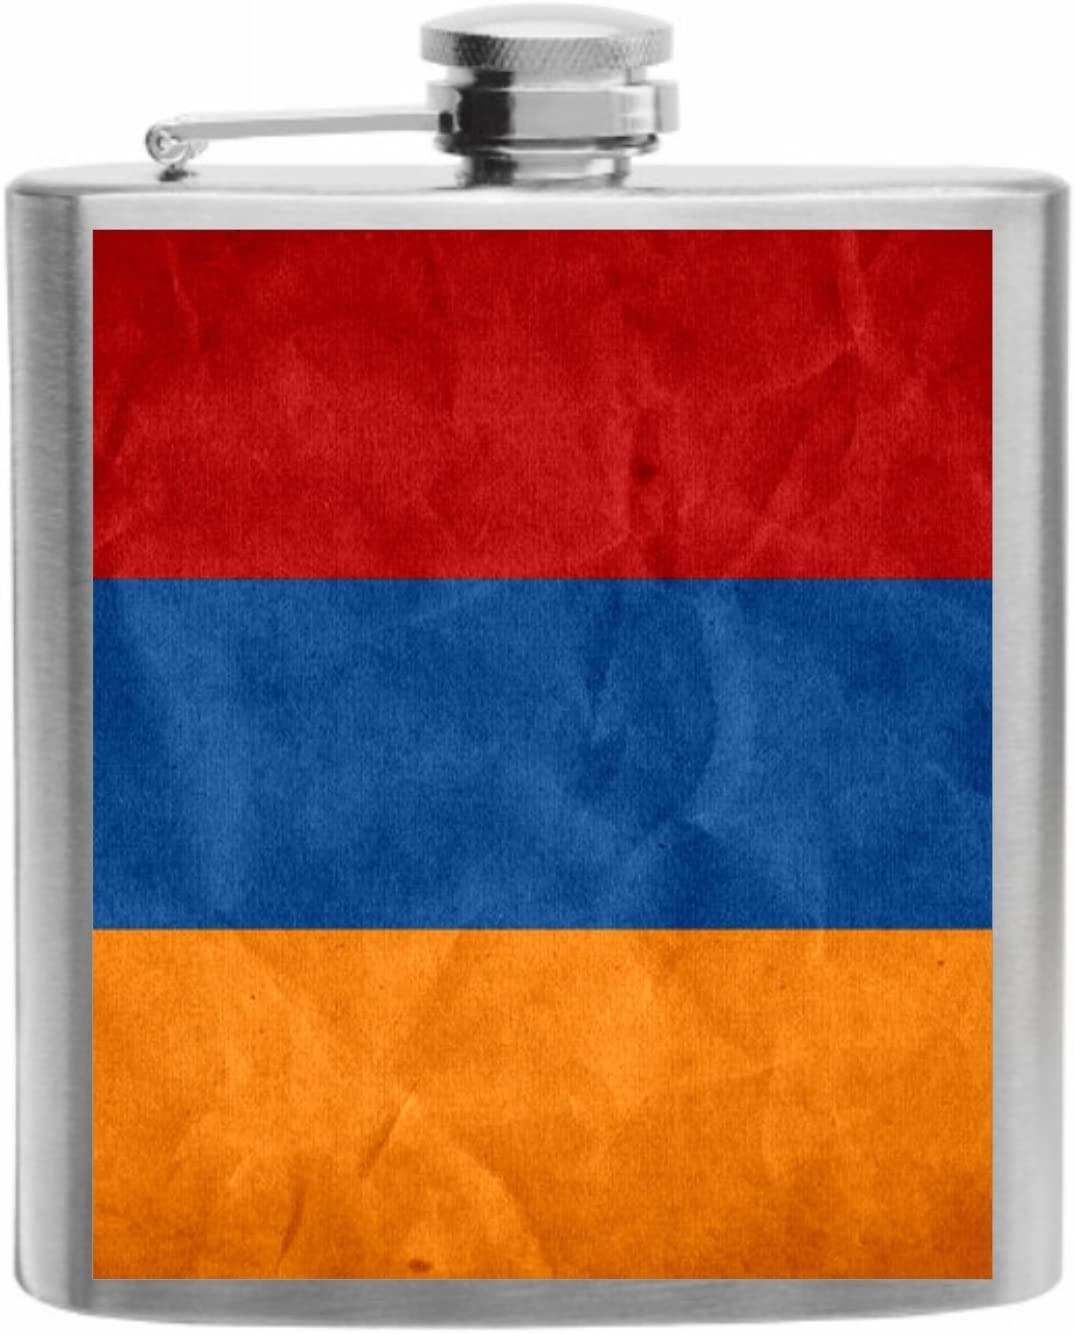 Armenia Flag Stainless Steel Hip Flask 6oz Gift